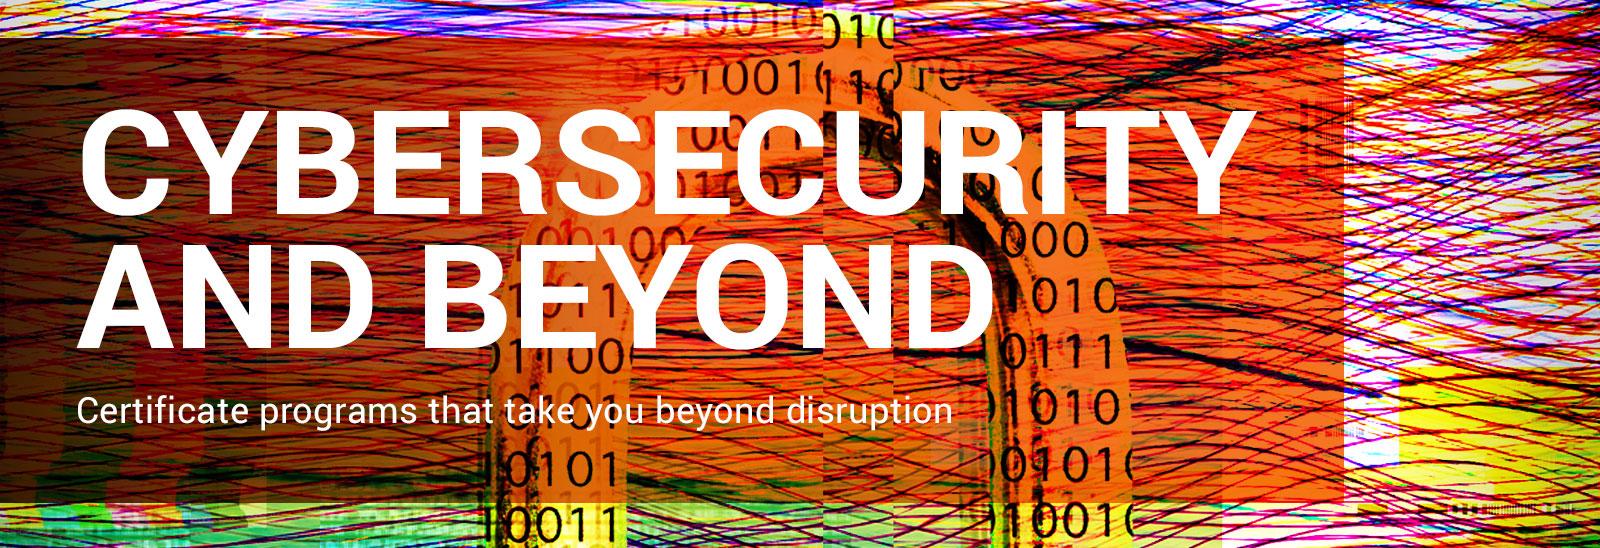 Cybersecurity Certificates Aicpa Certificates